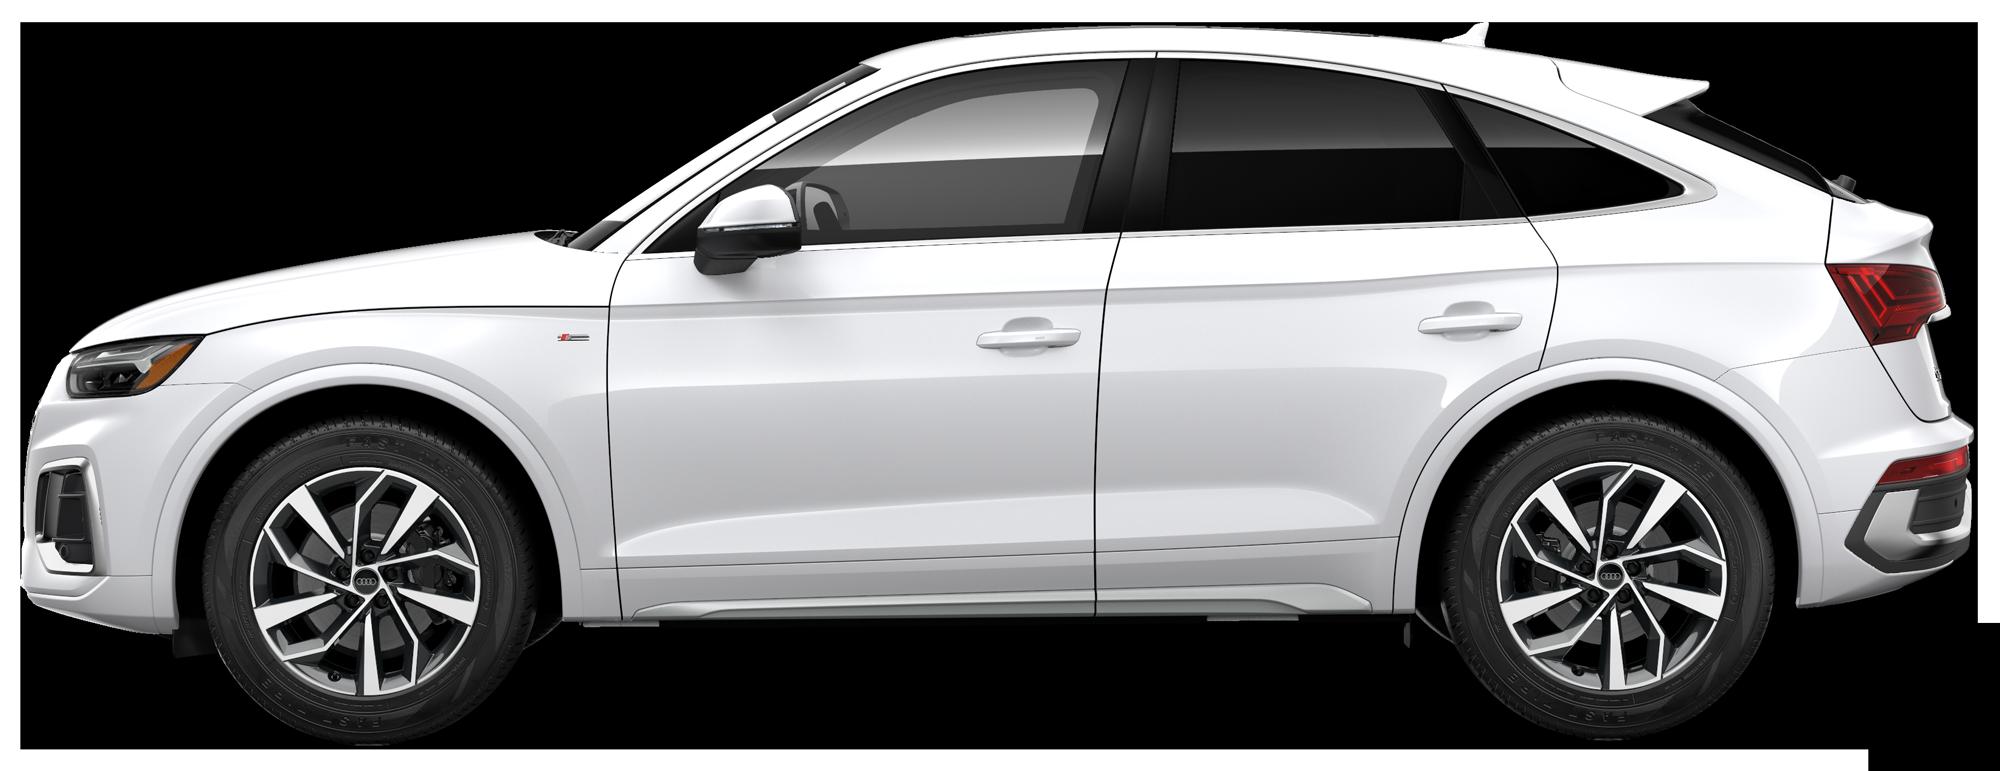 2022 Audi Q5 Sportback SUV 45 S line Premium